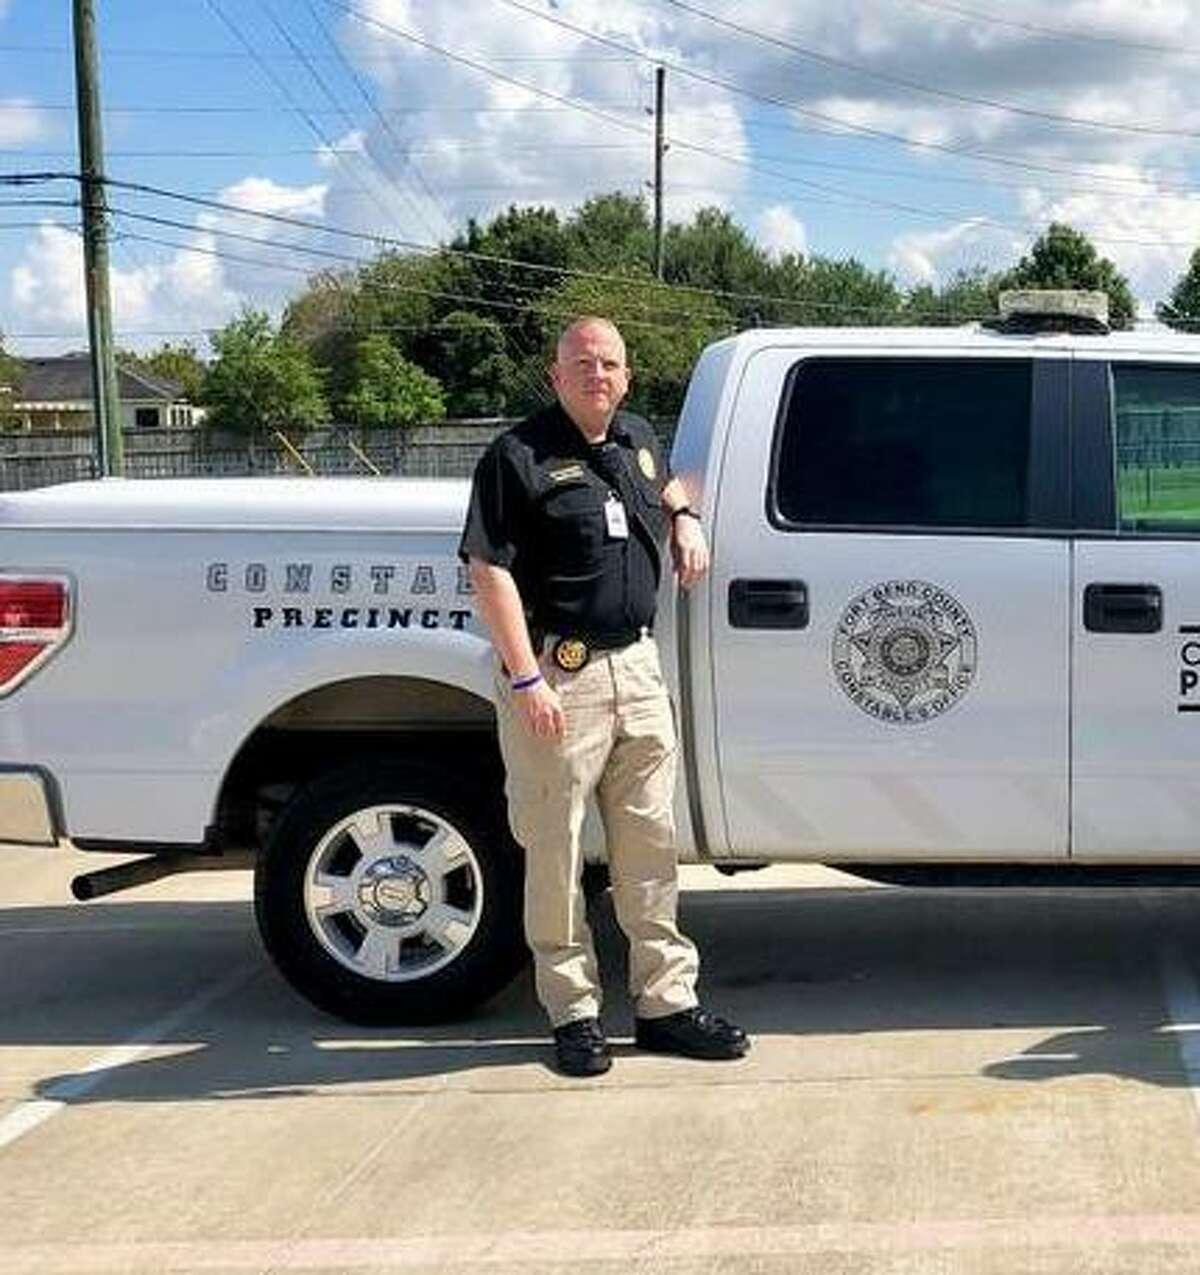 Fort Bend County Precinct 3 Constable Wayne Thompson, left, and Fort Bend County Precinct 3 Commissioner Andy Meyers have implemented a pilot Motorist Assistance Program.